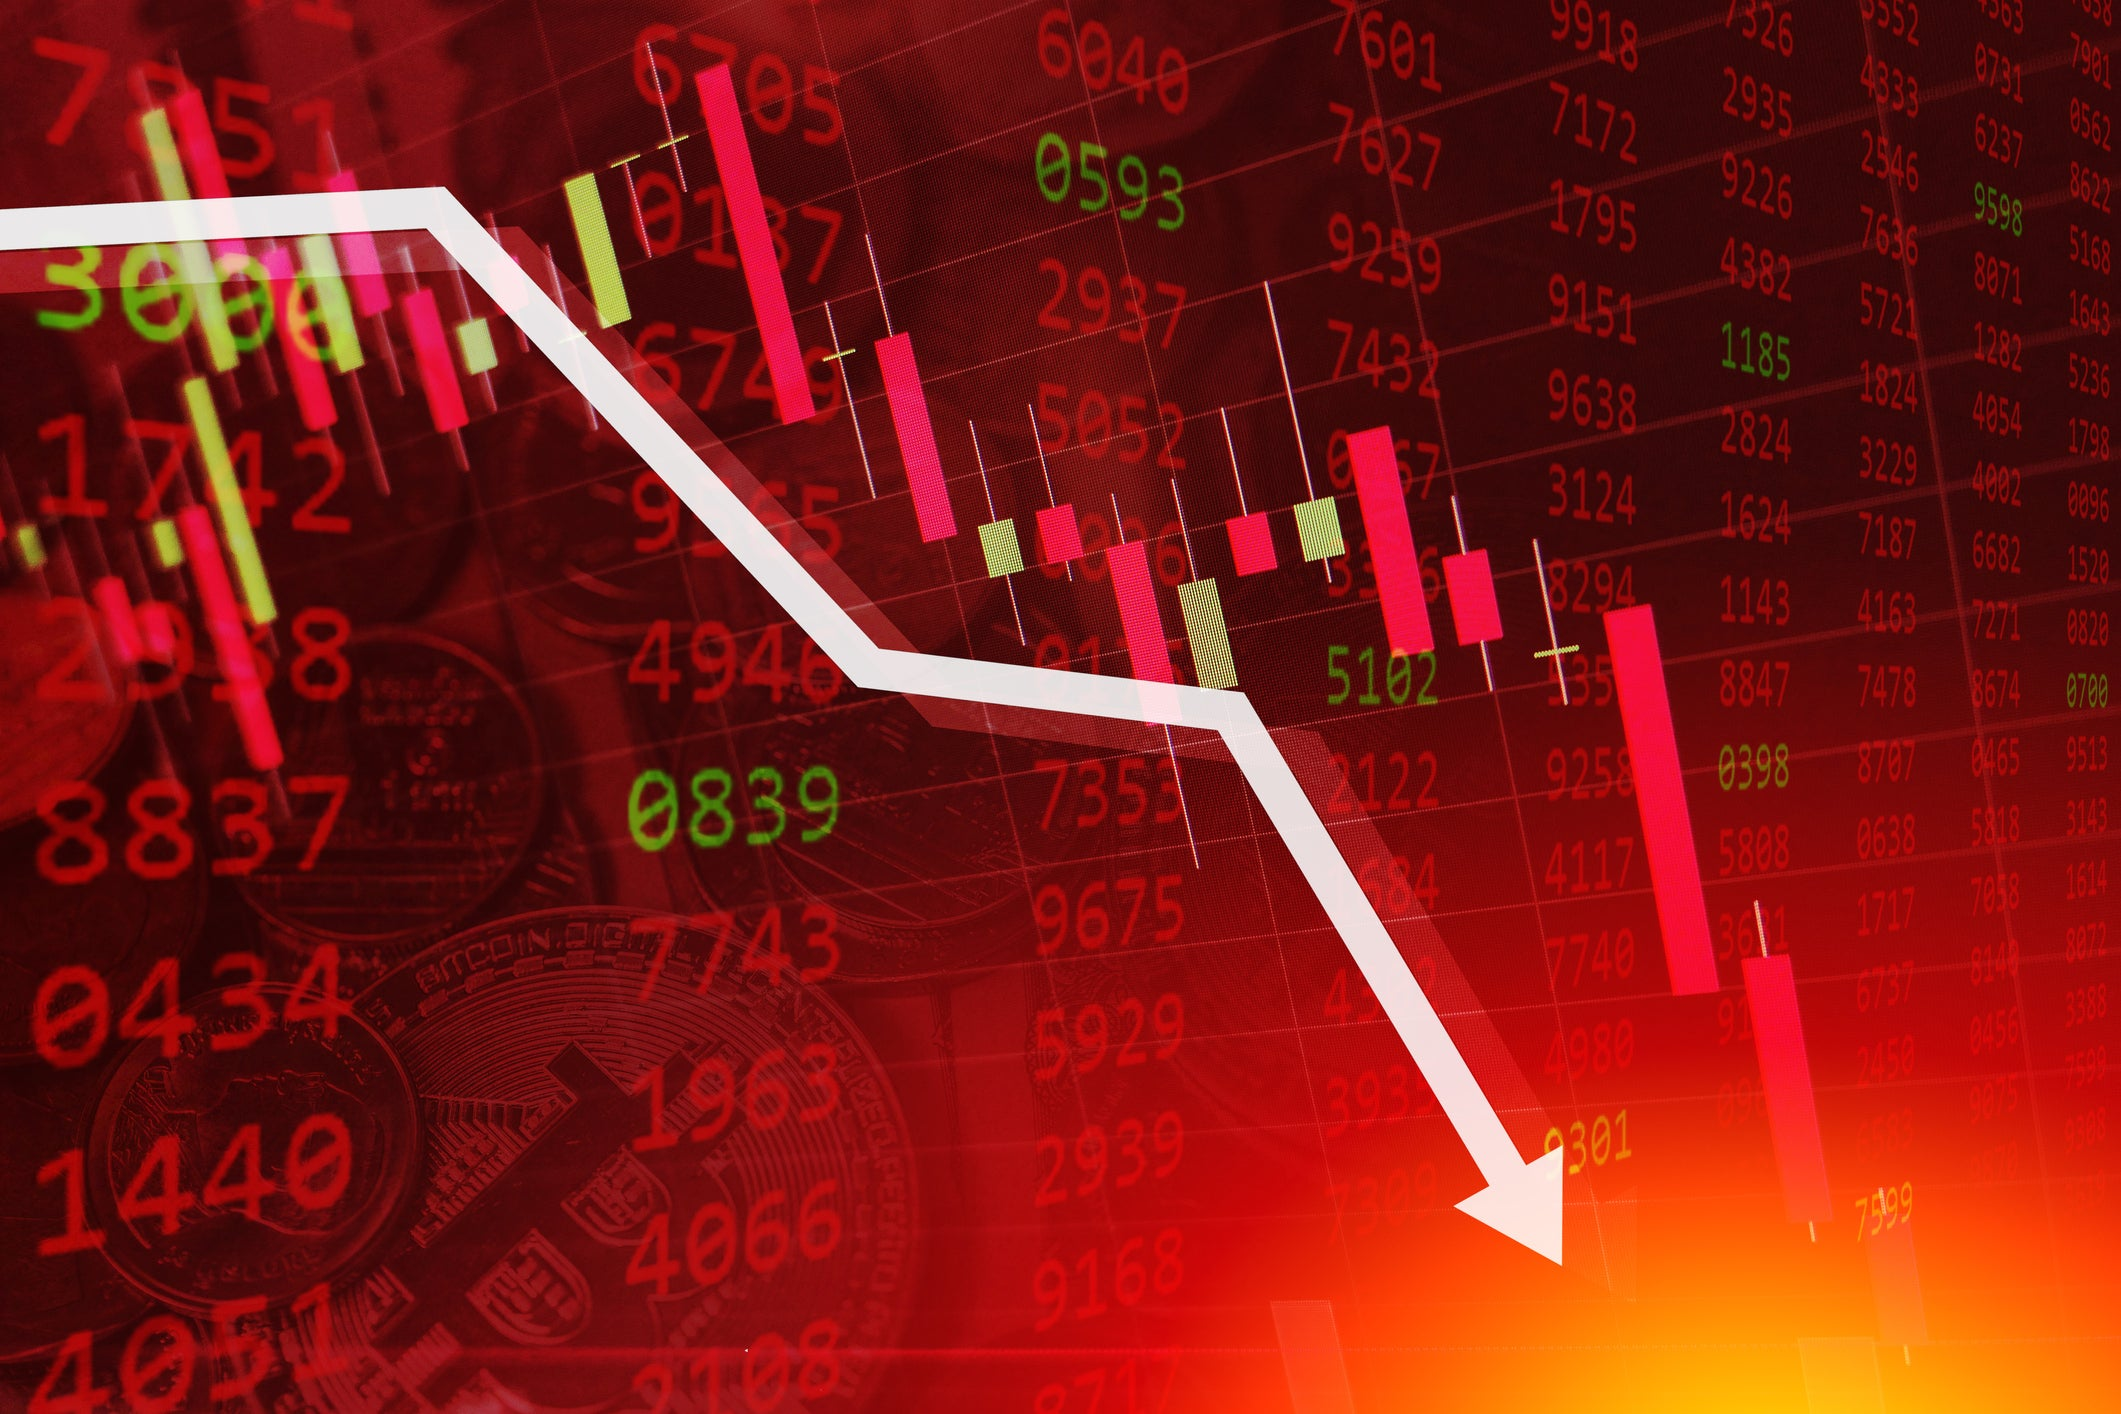 Why Tesla Stock Fell Further on Monday - Motley Fool